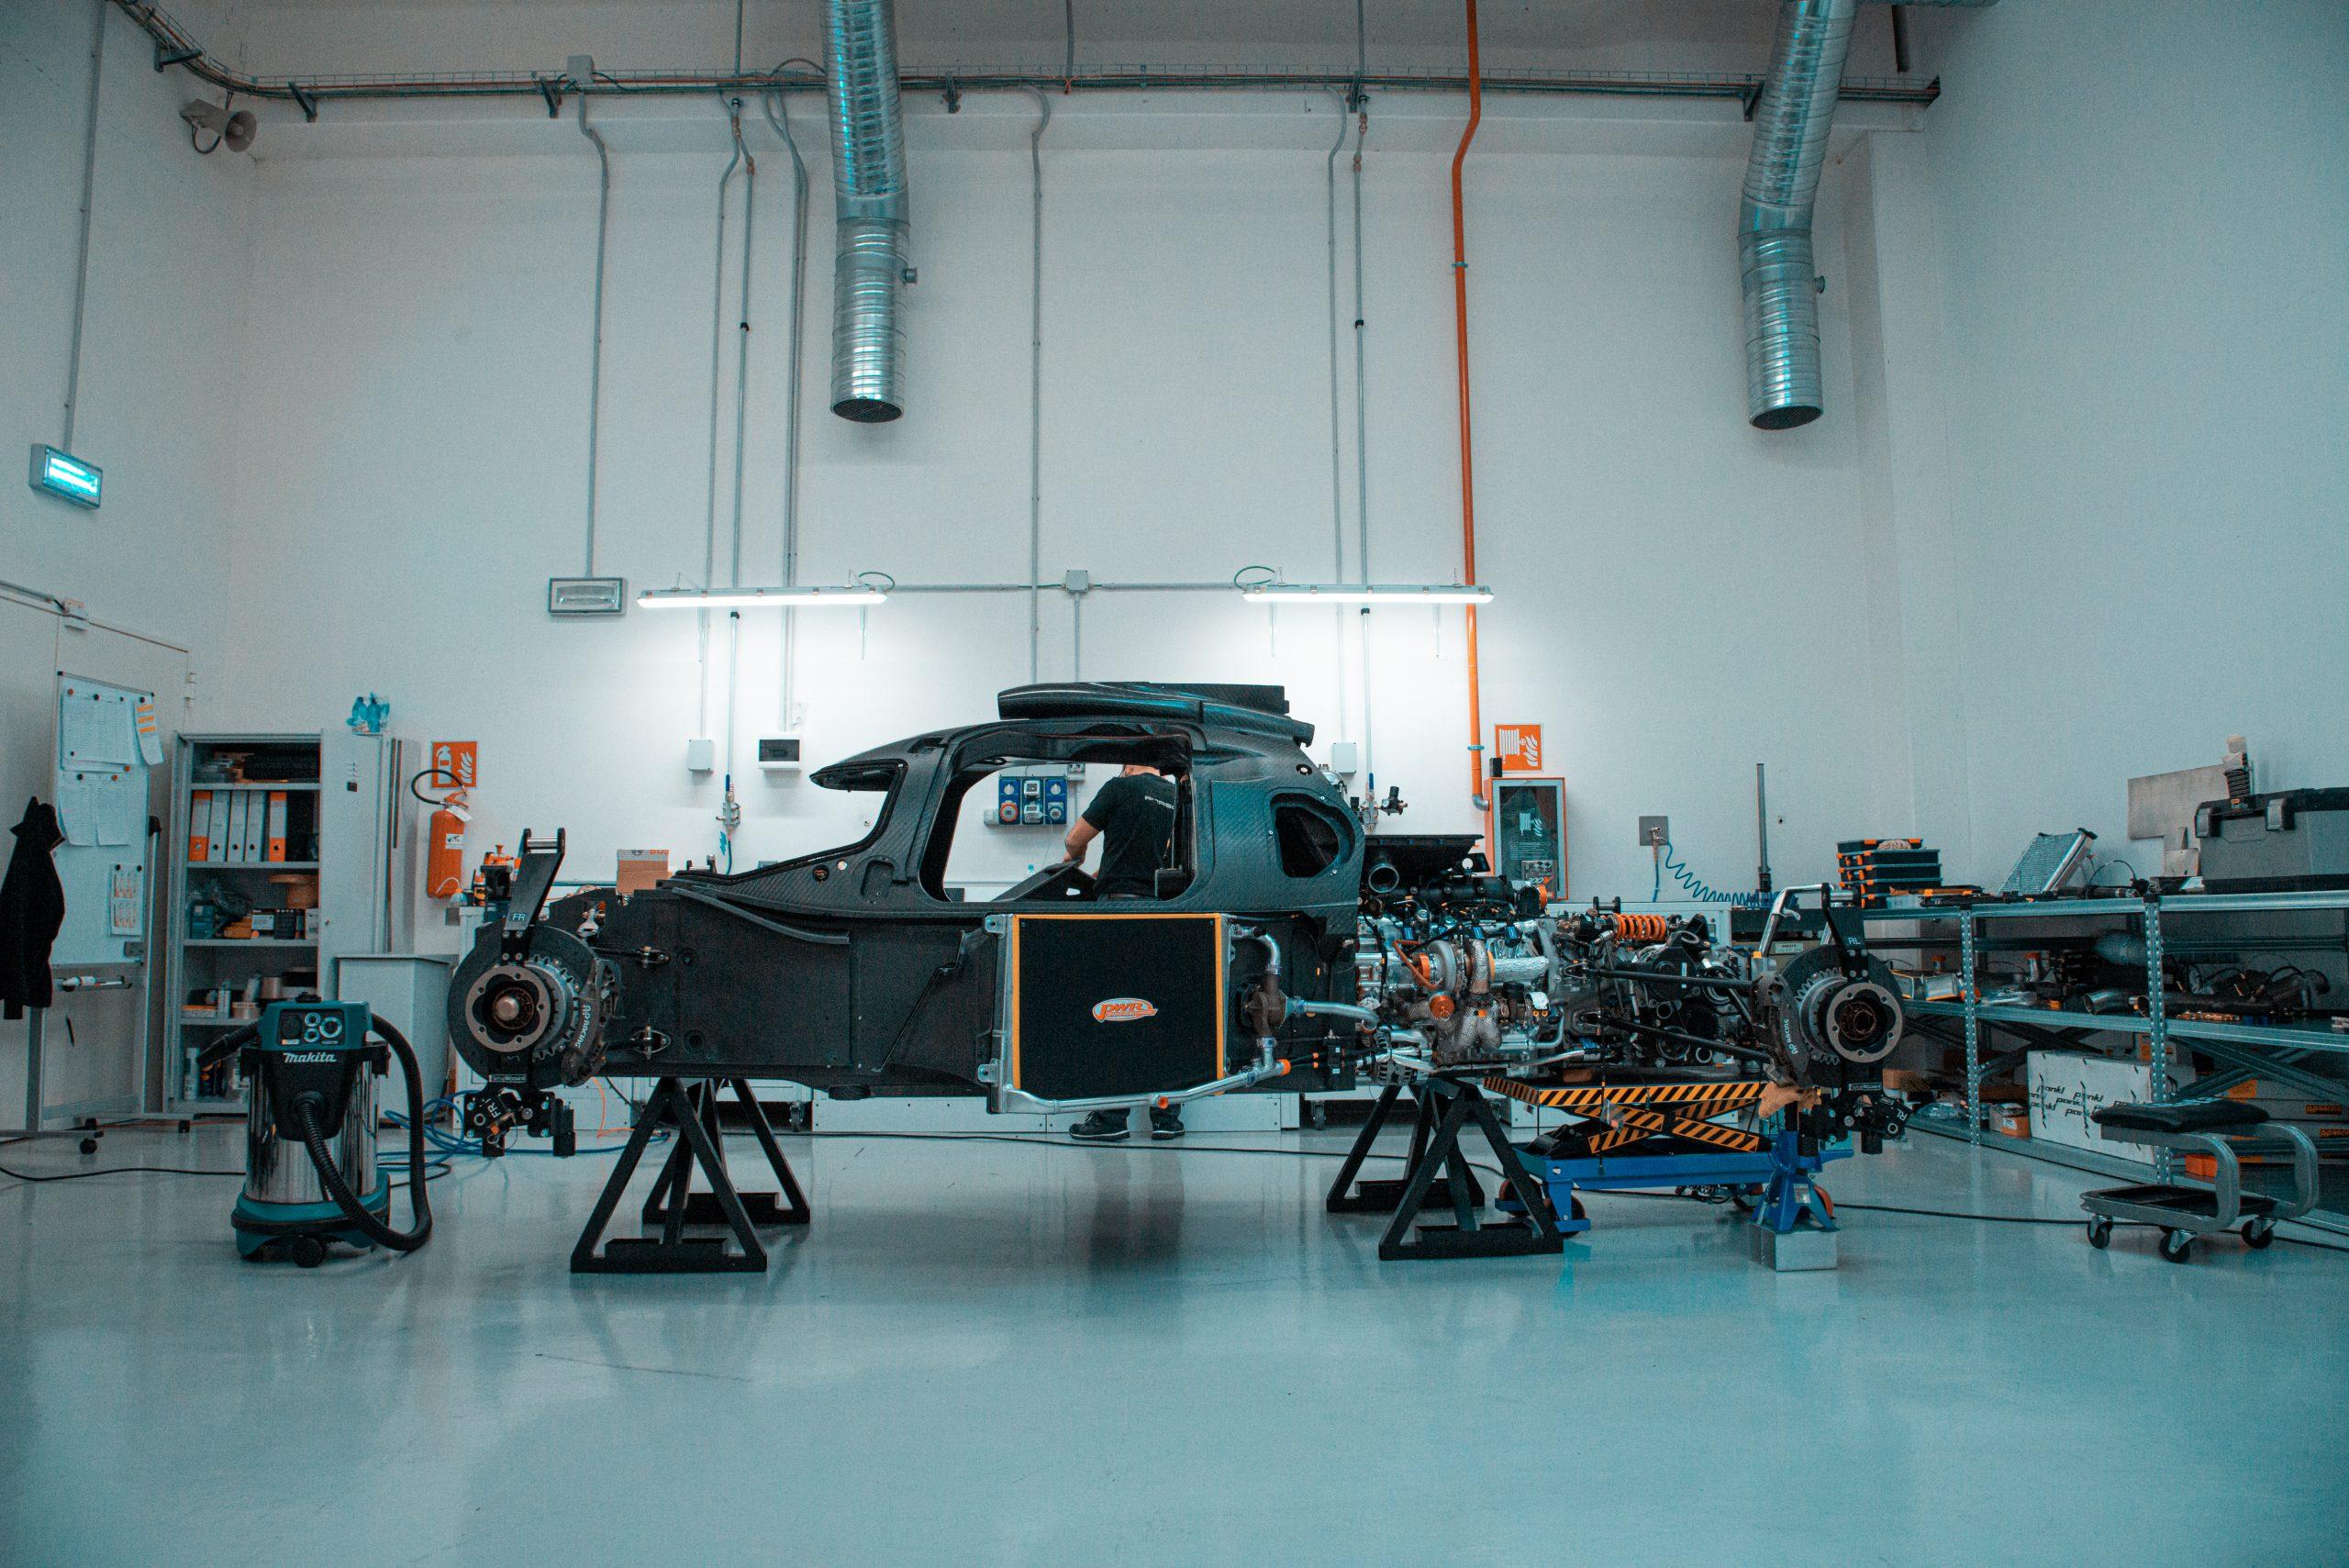 SCG Scuderia Glickenhaus 007 Hypercar LMH monocoque engine